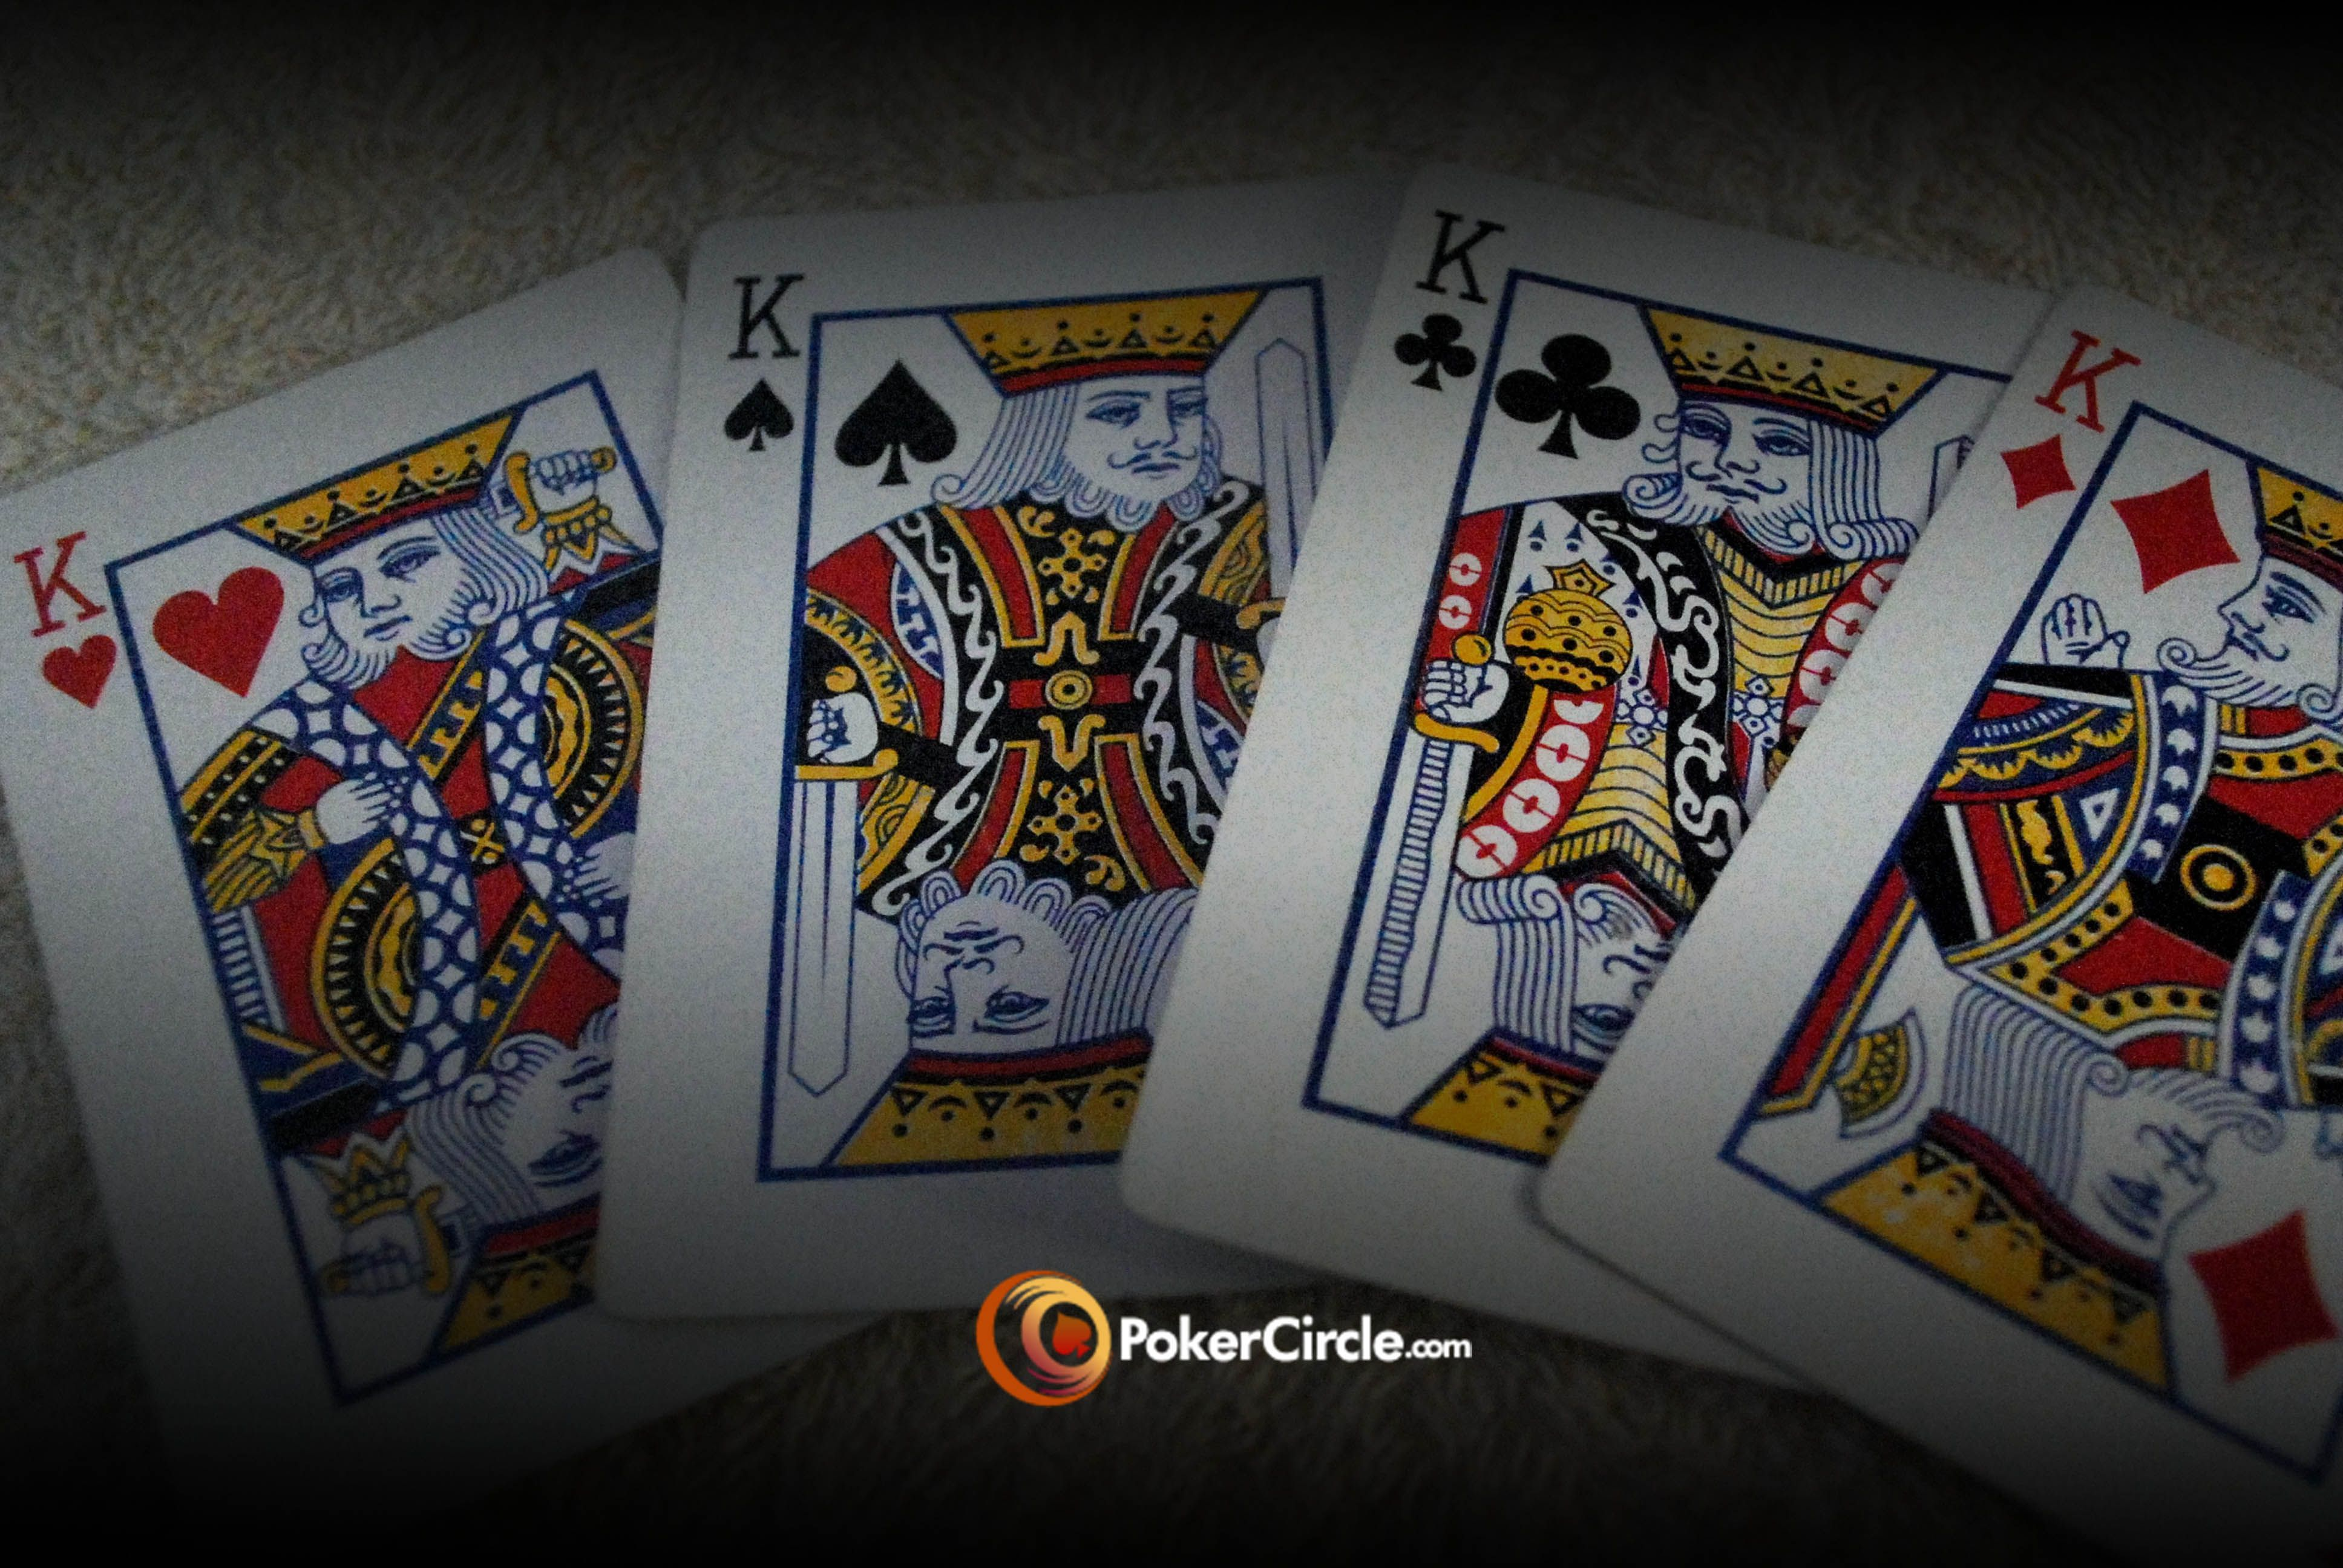 Wanna expert poker player? No longer be novice at